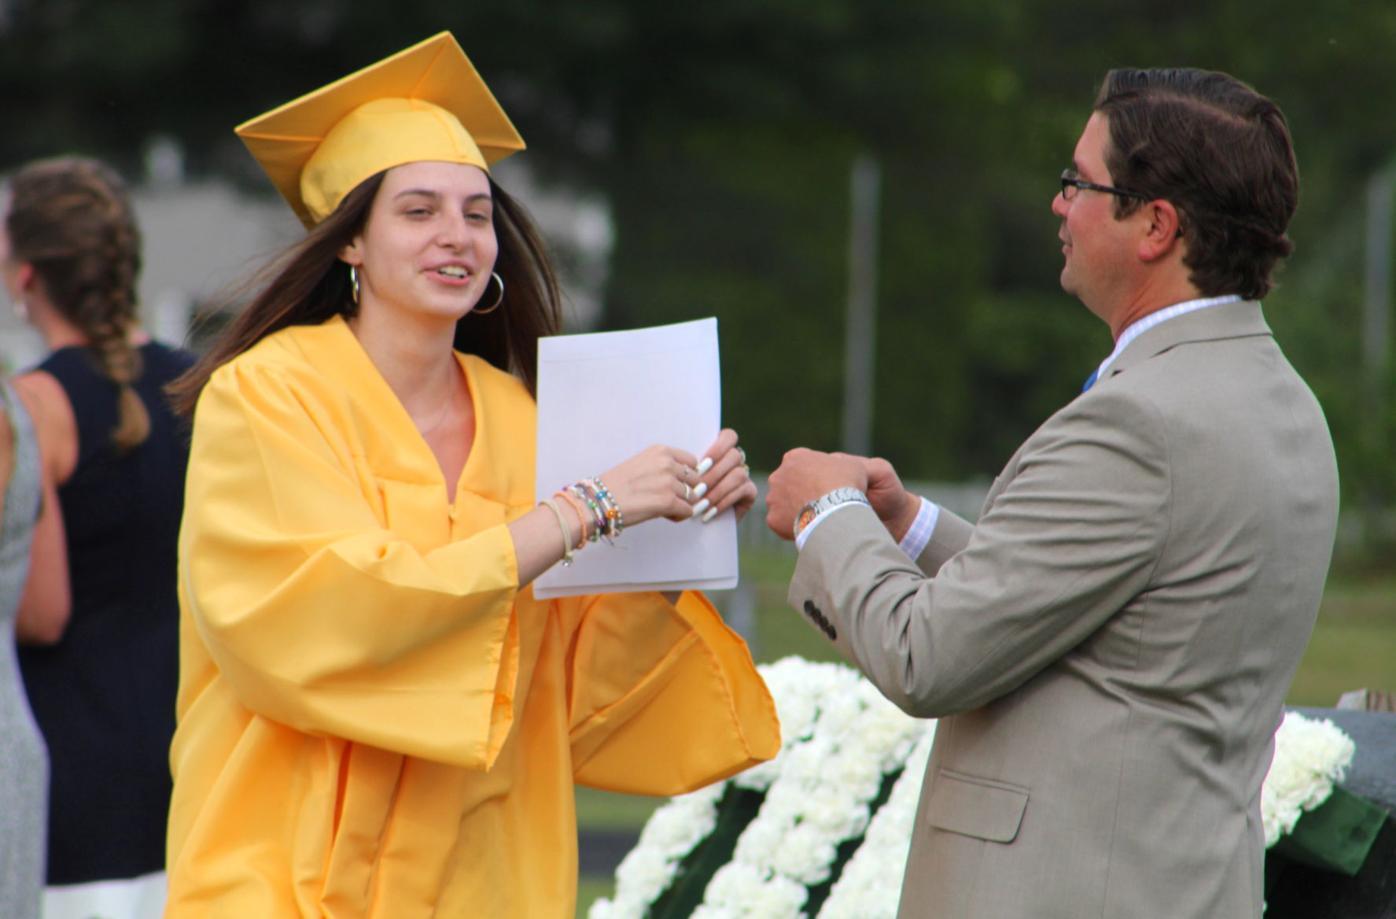 School of Technology graduation